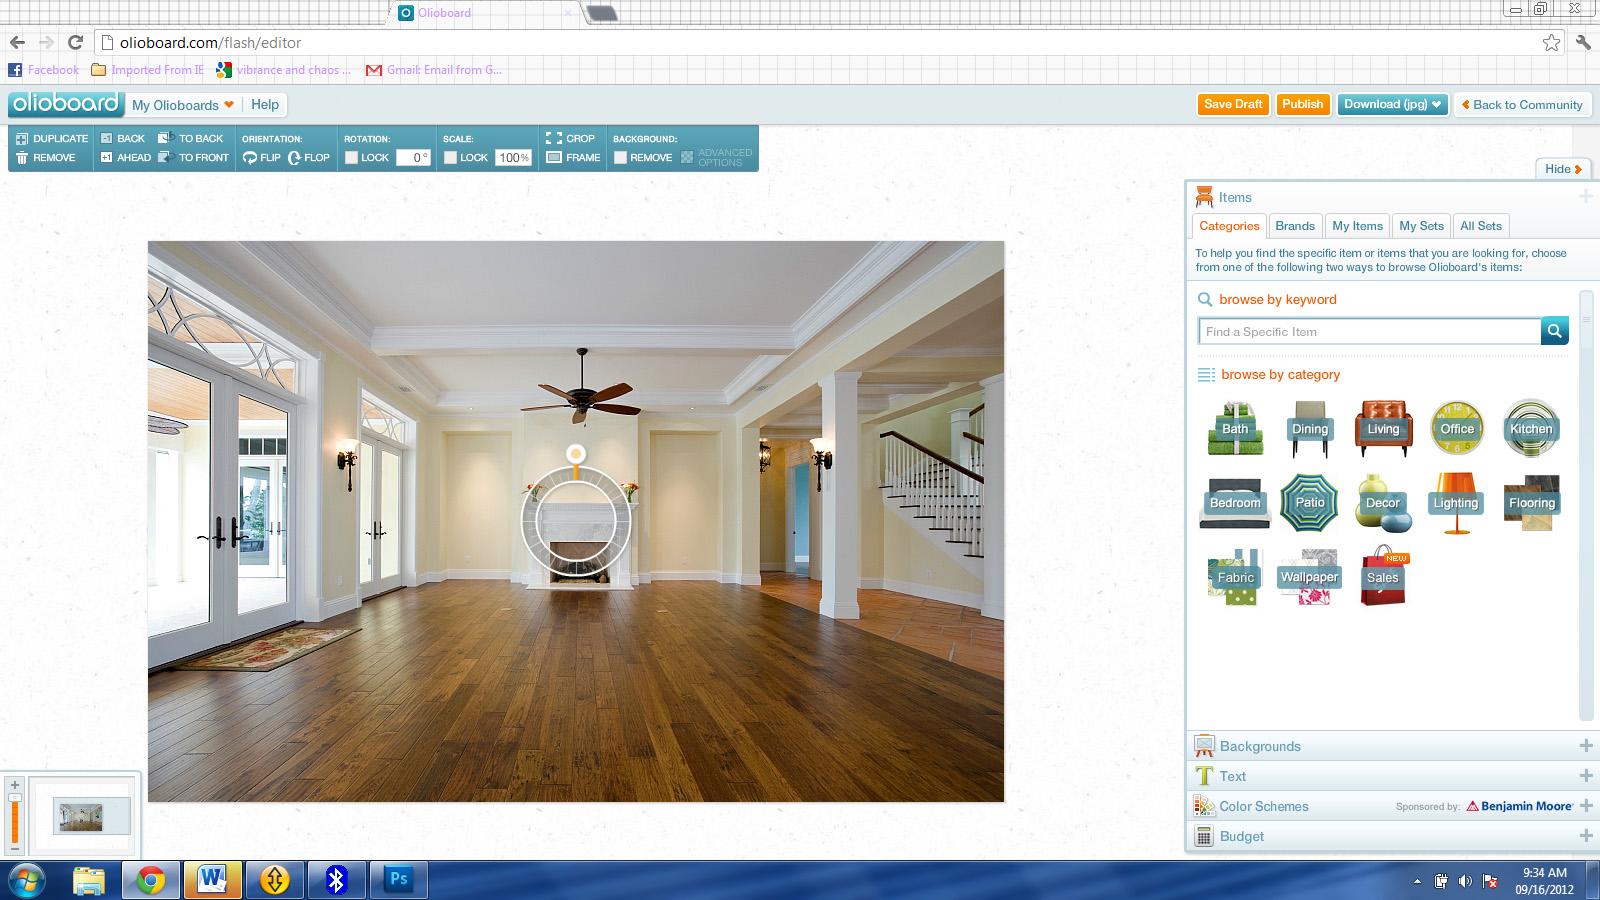 Uncategorized interior design tool online hoalily home Online interior design tool